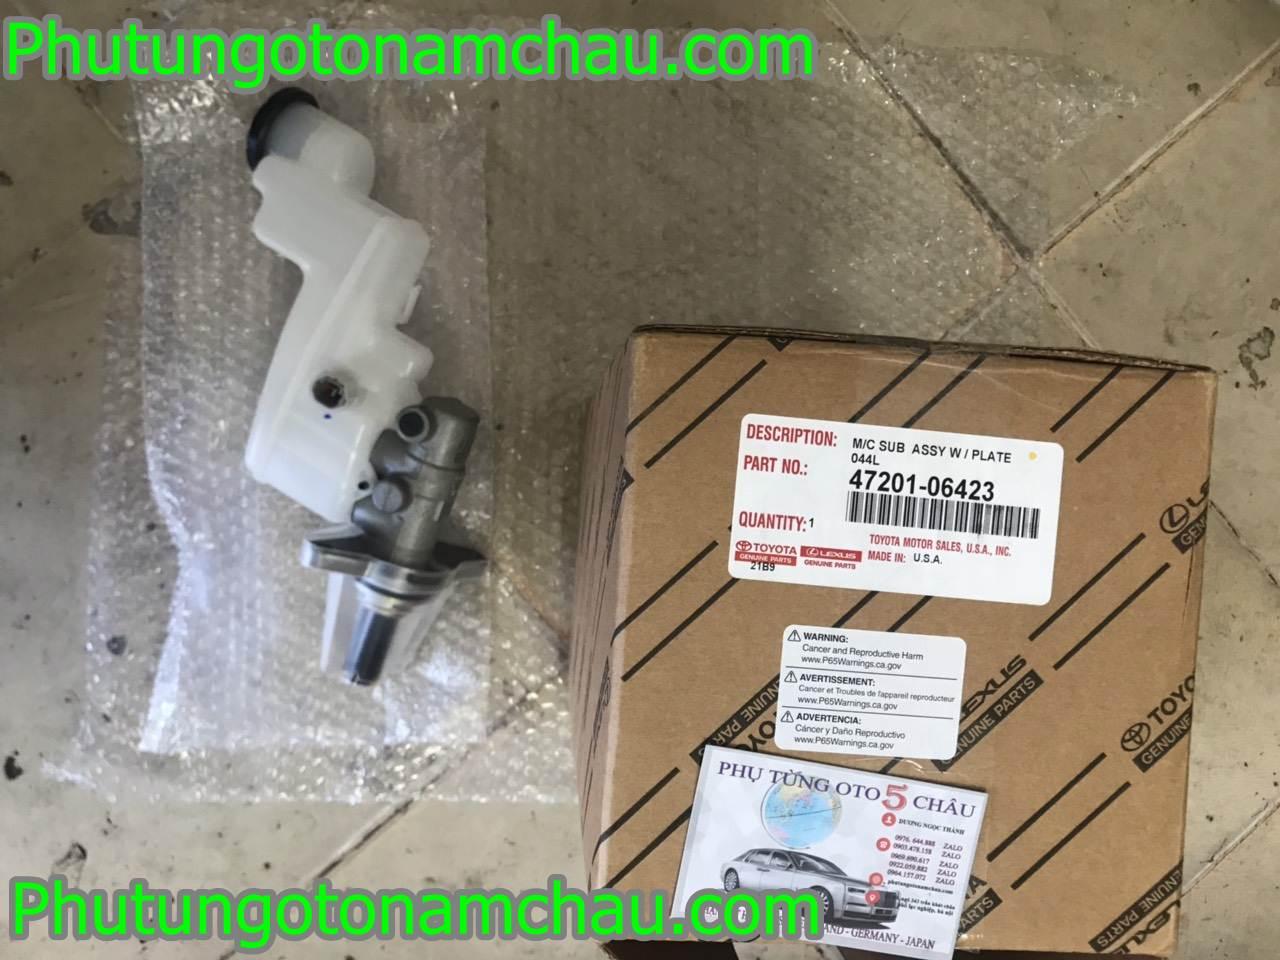 Tổng Phanh Toyota Avalon 47201-06423